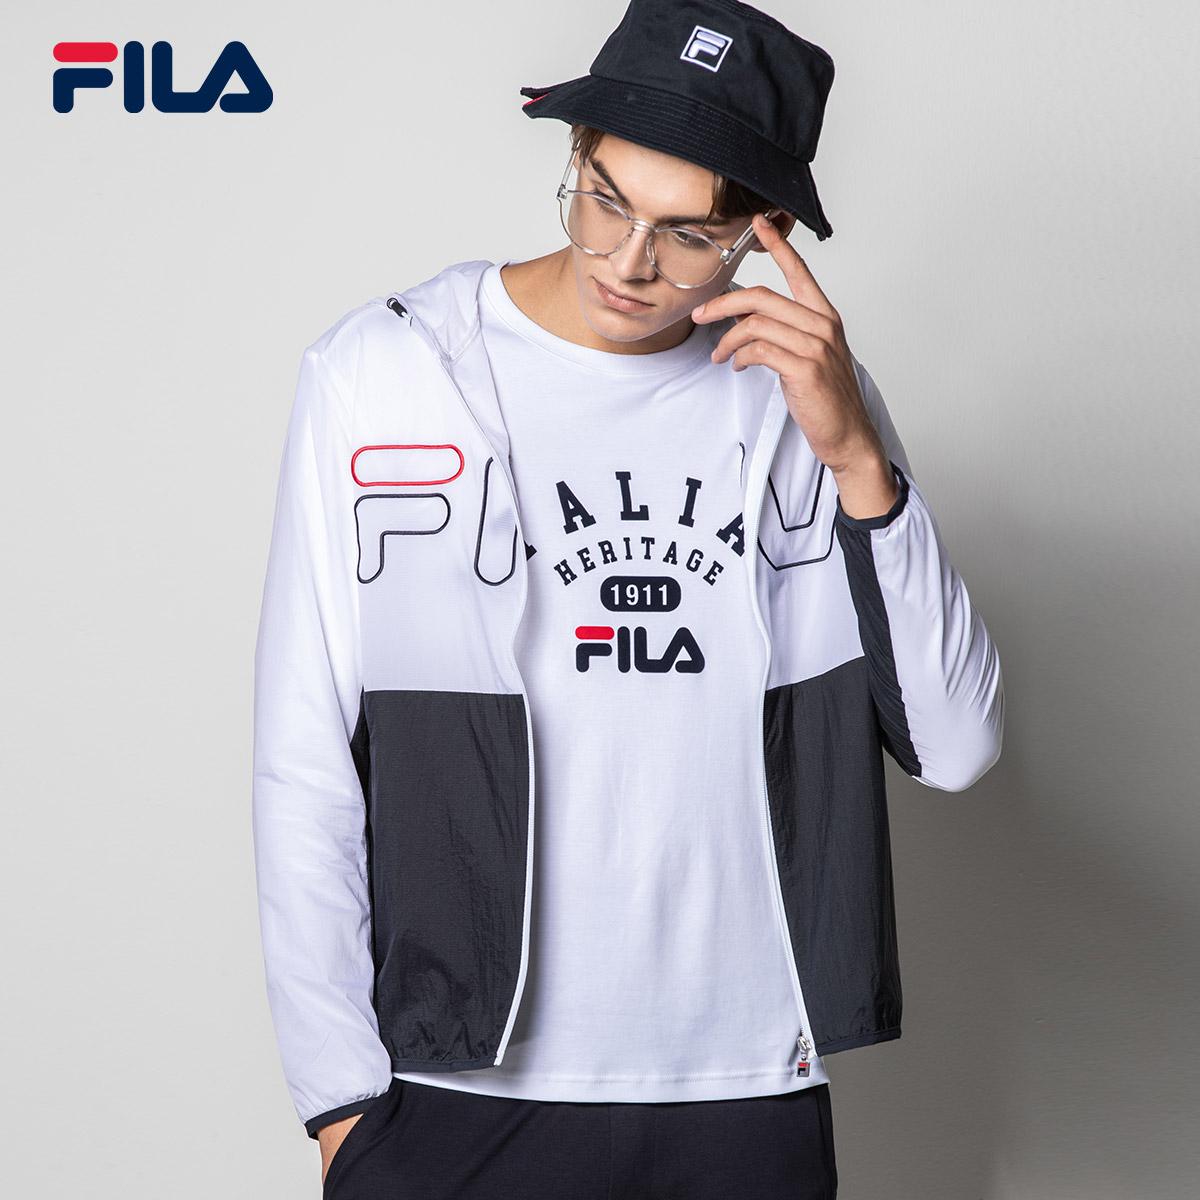 FILA斐乐男外套2018秋季新款时尚街头潮范运动休闲连帽舒适外套男